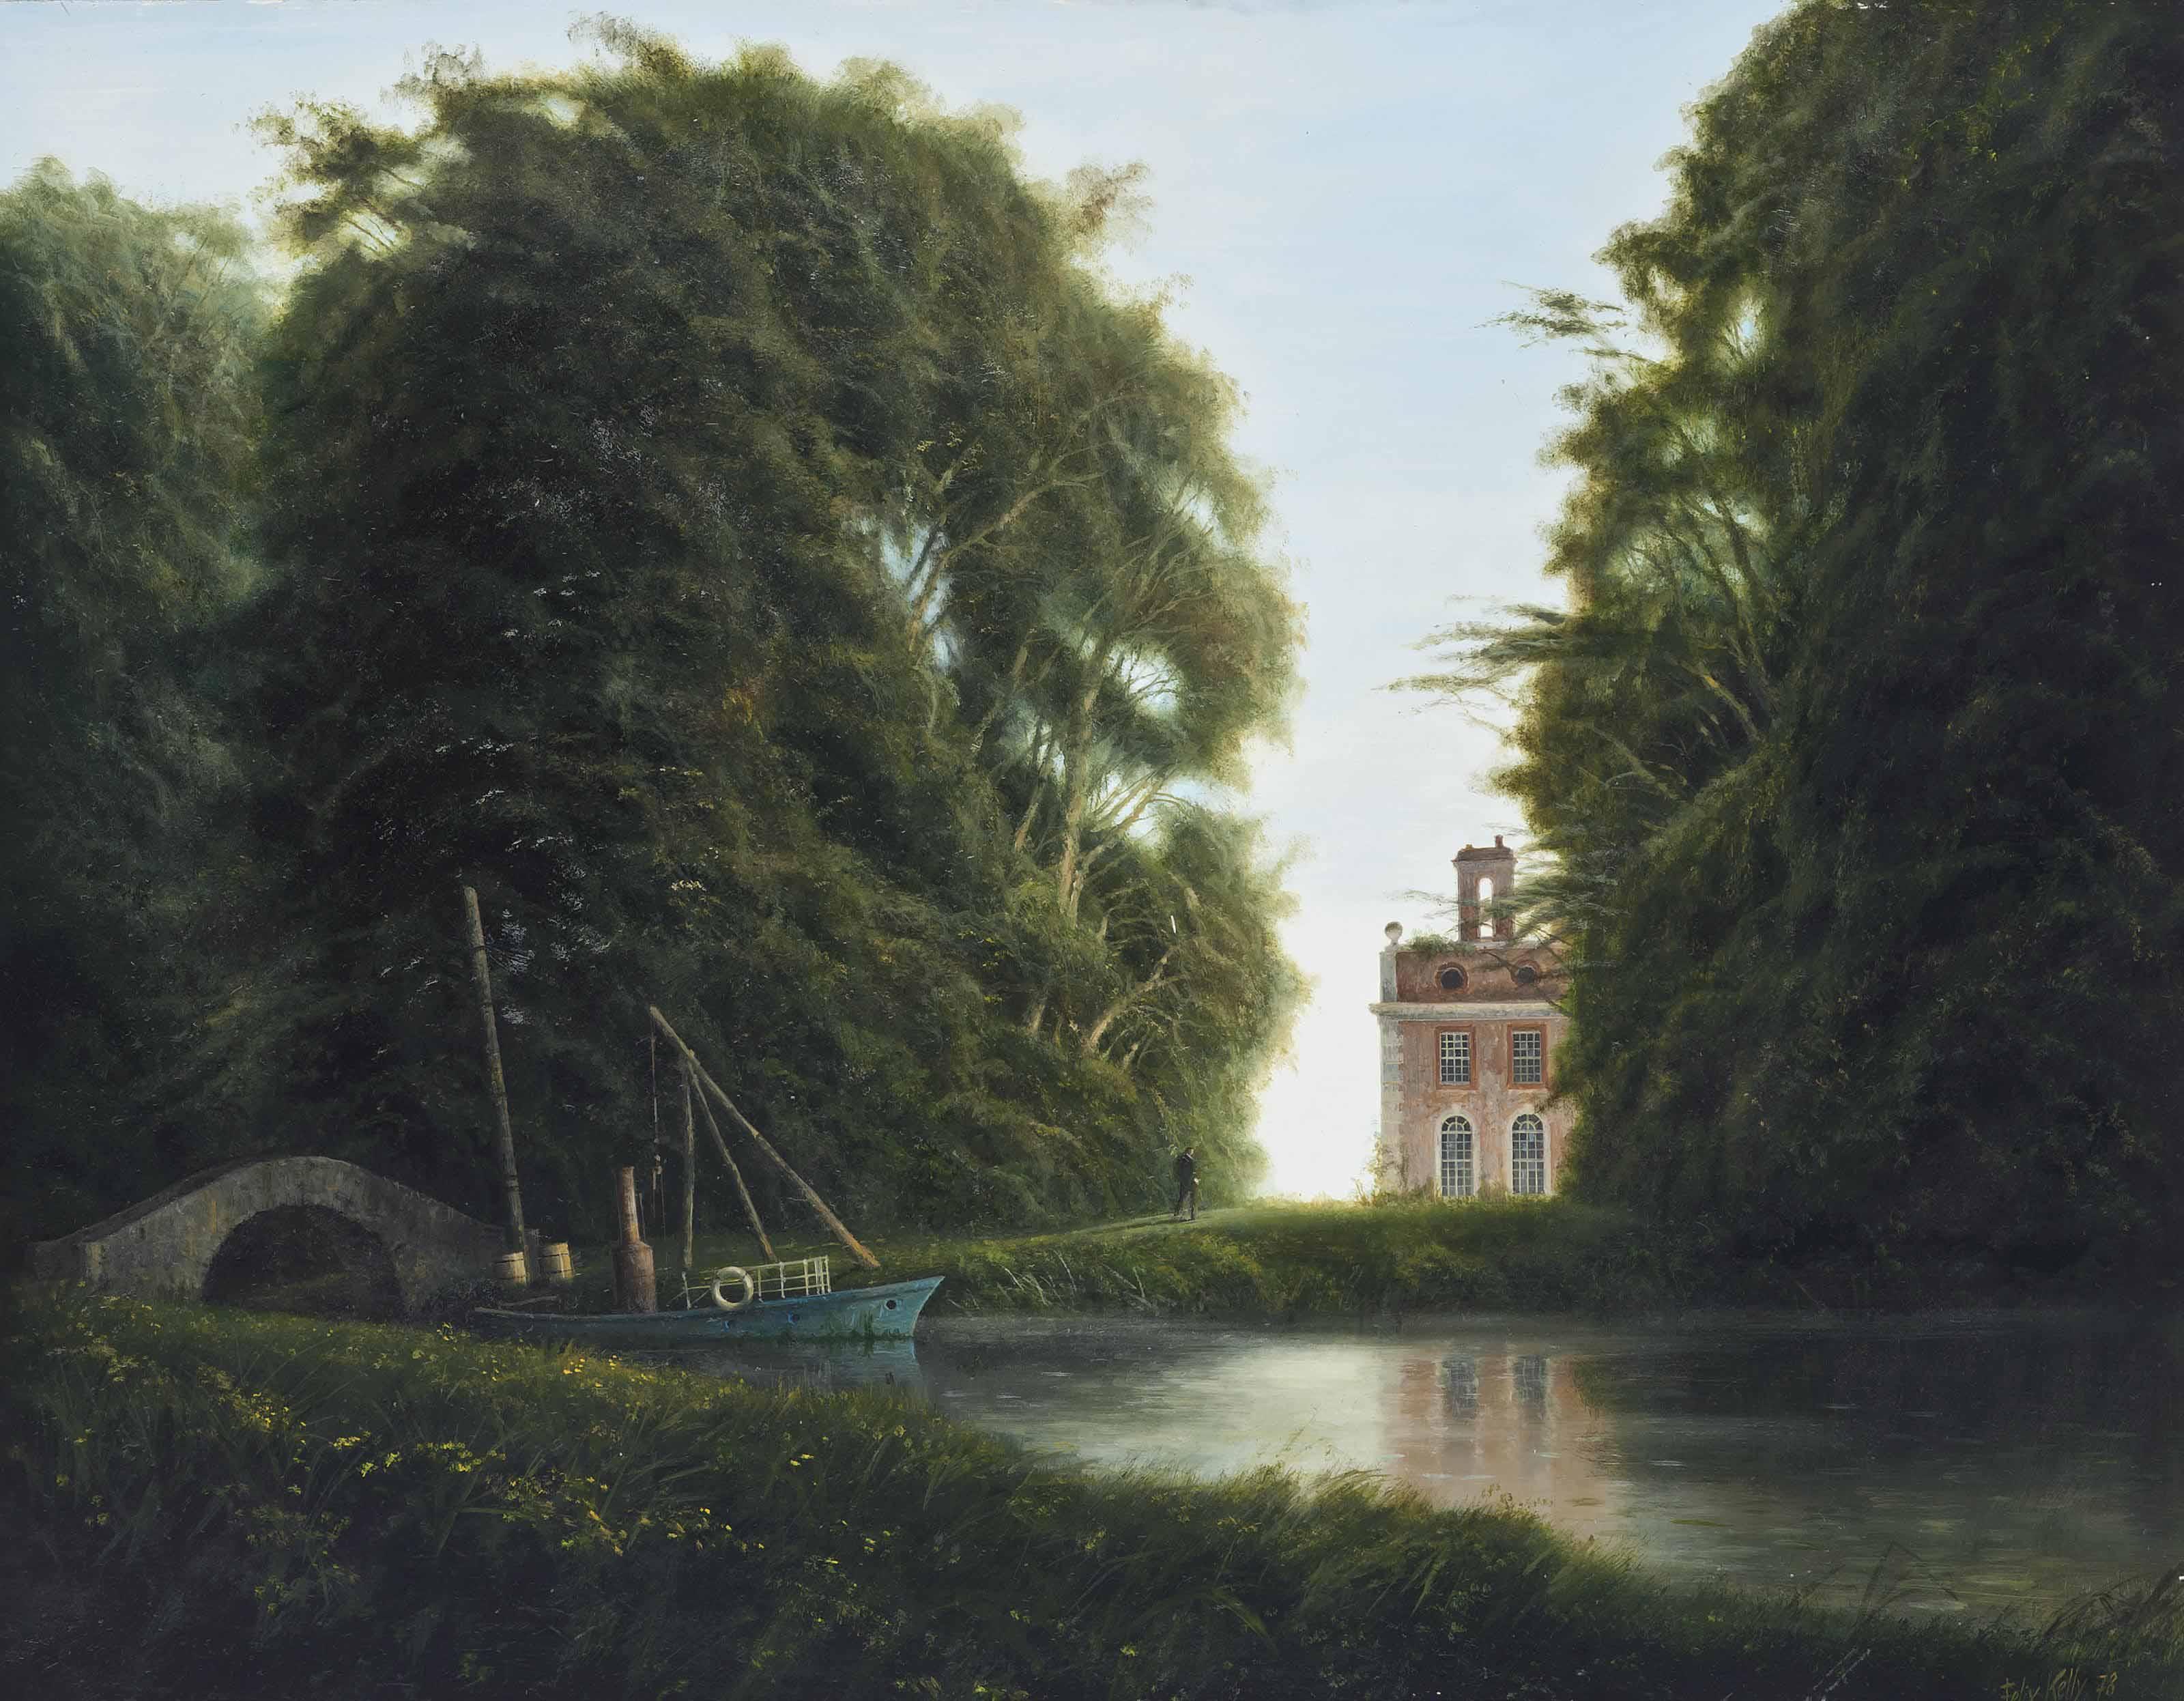 Canal through the park